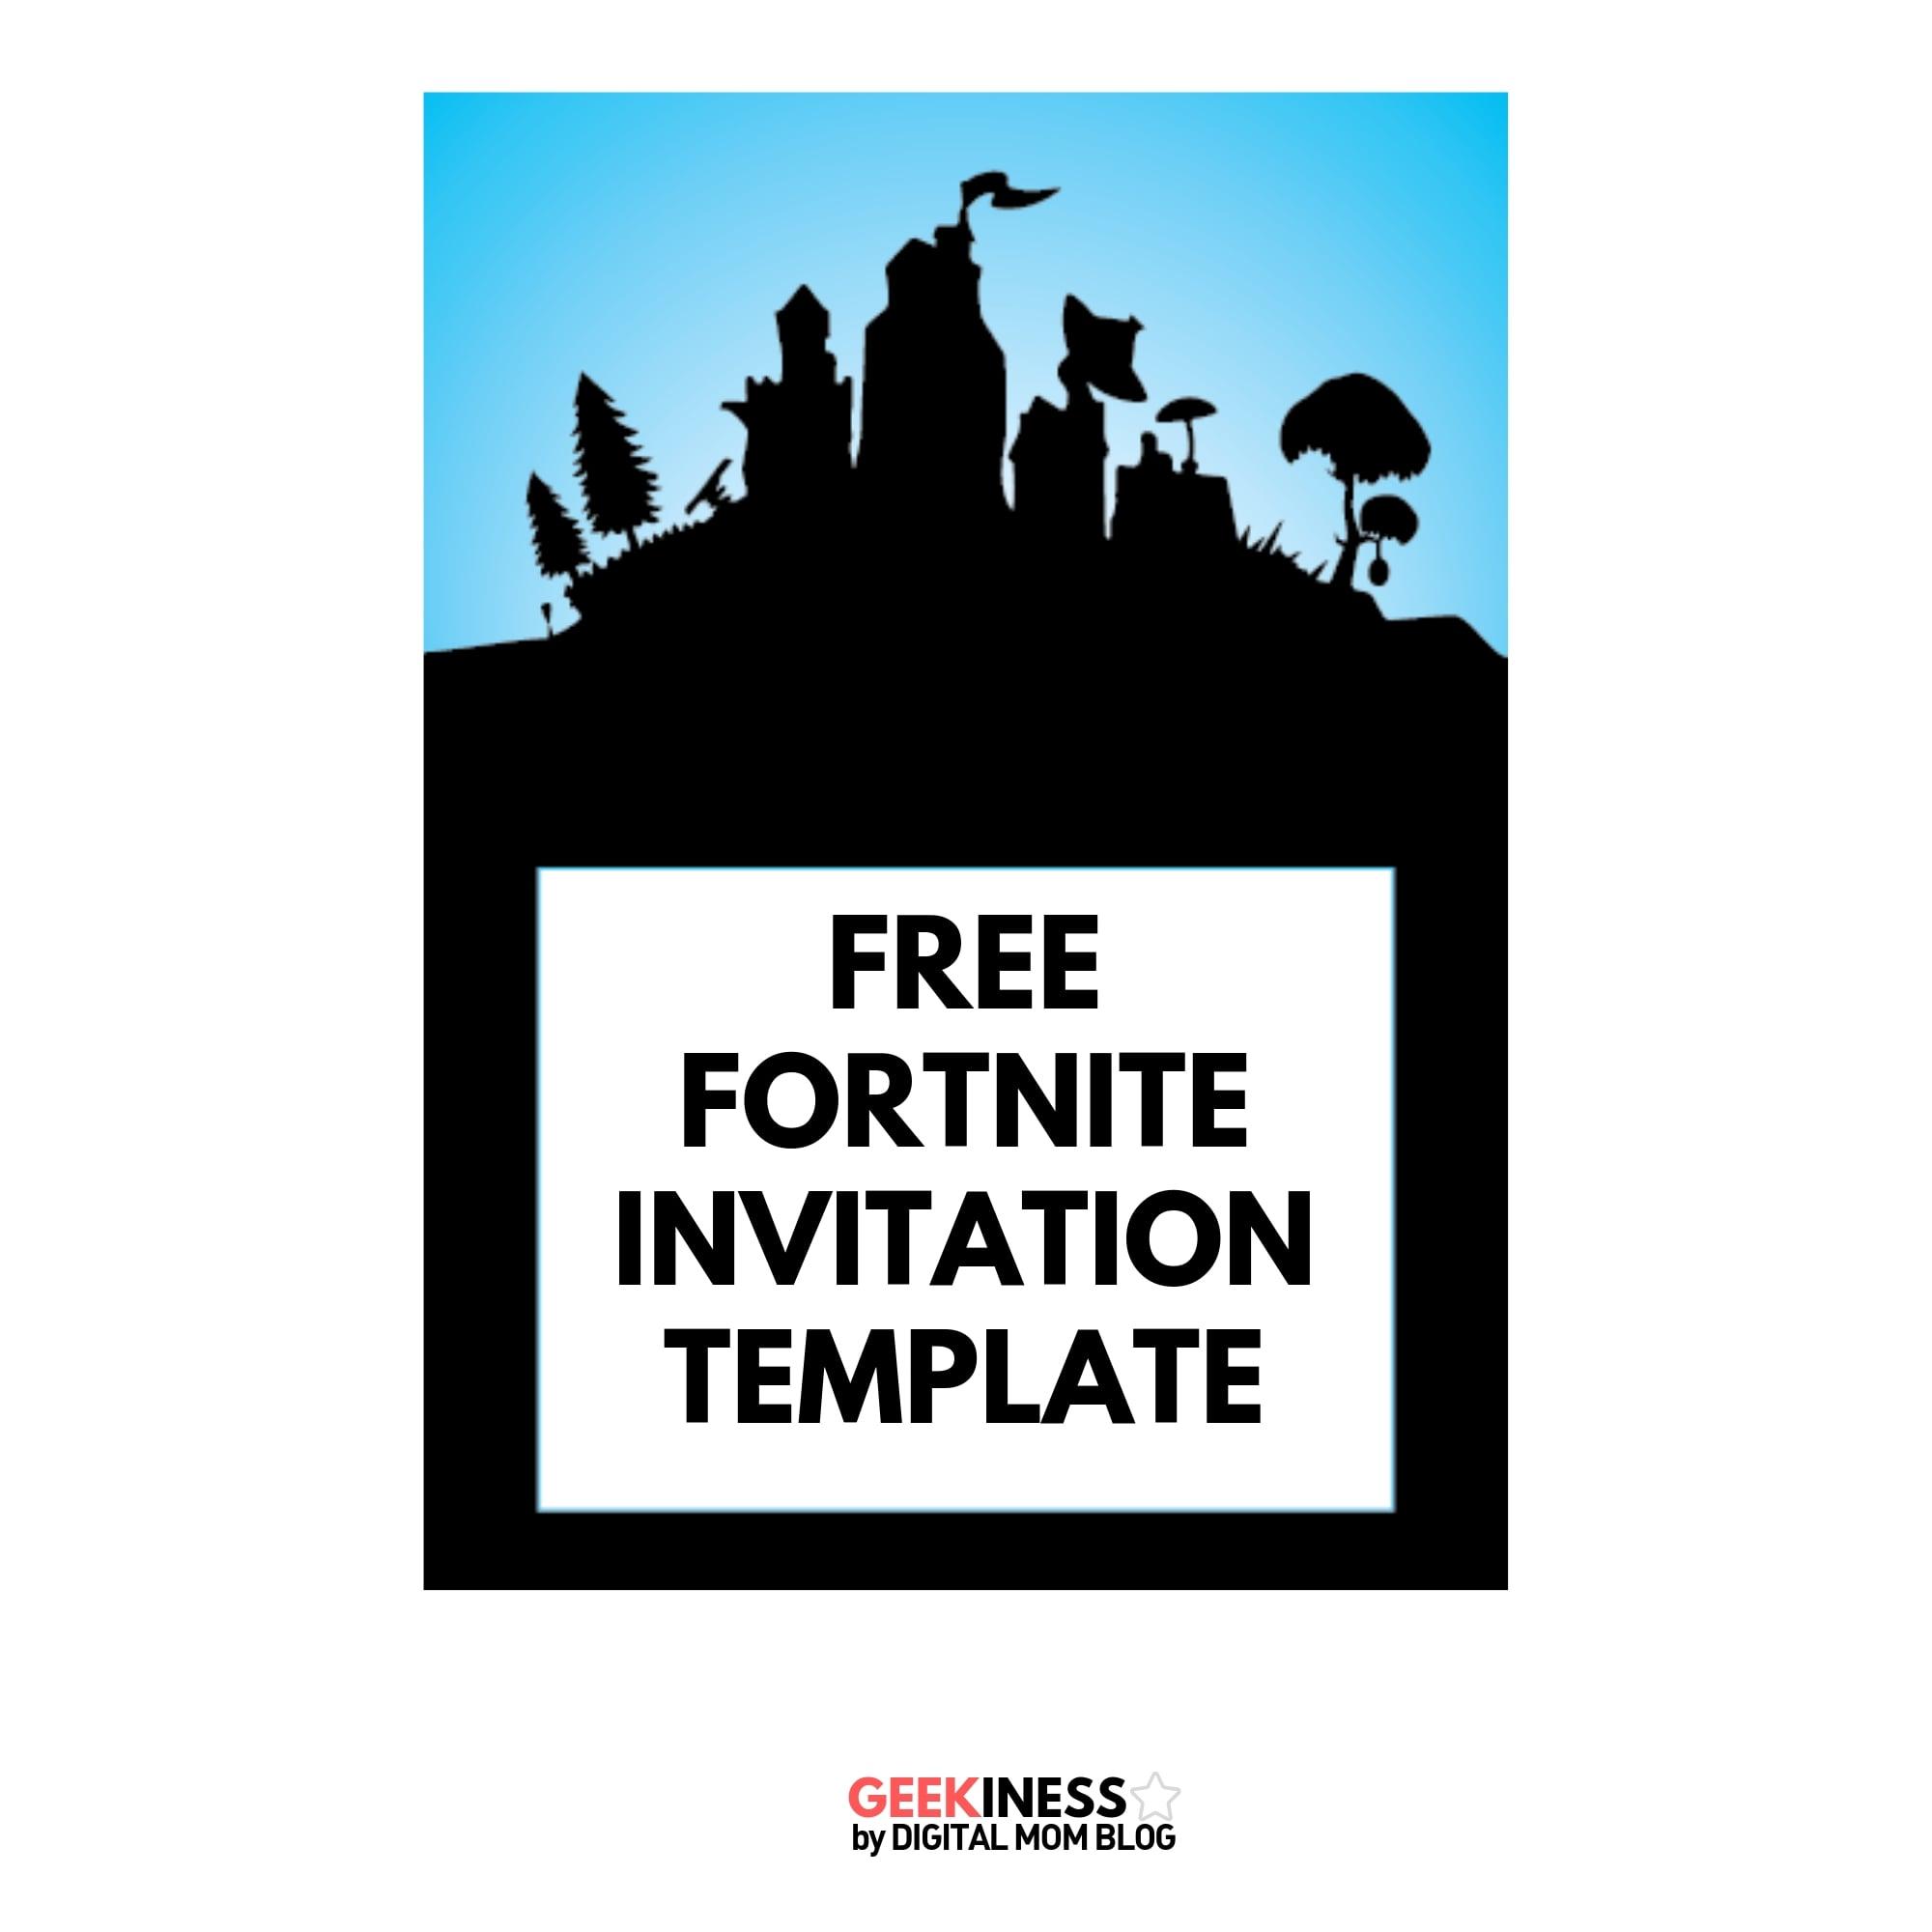 free fortnite invite